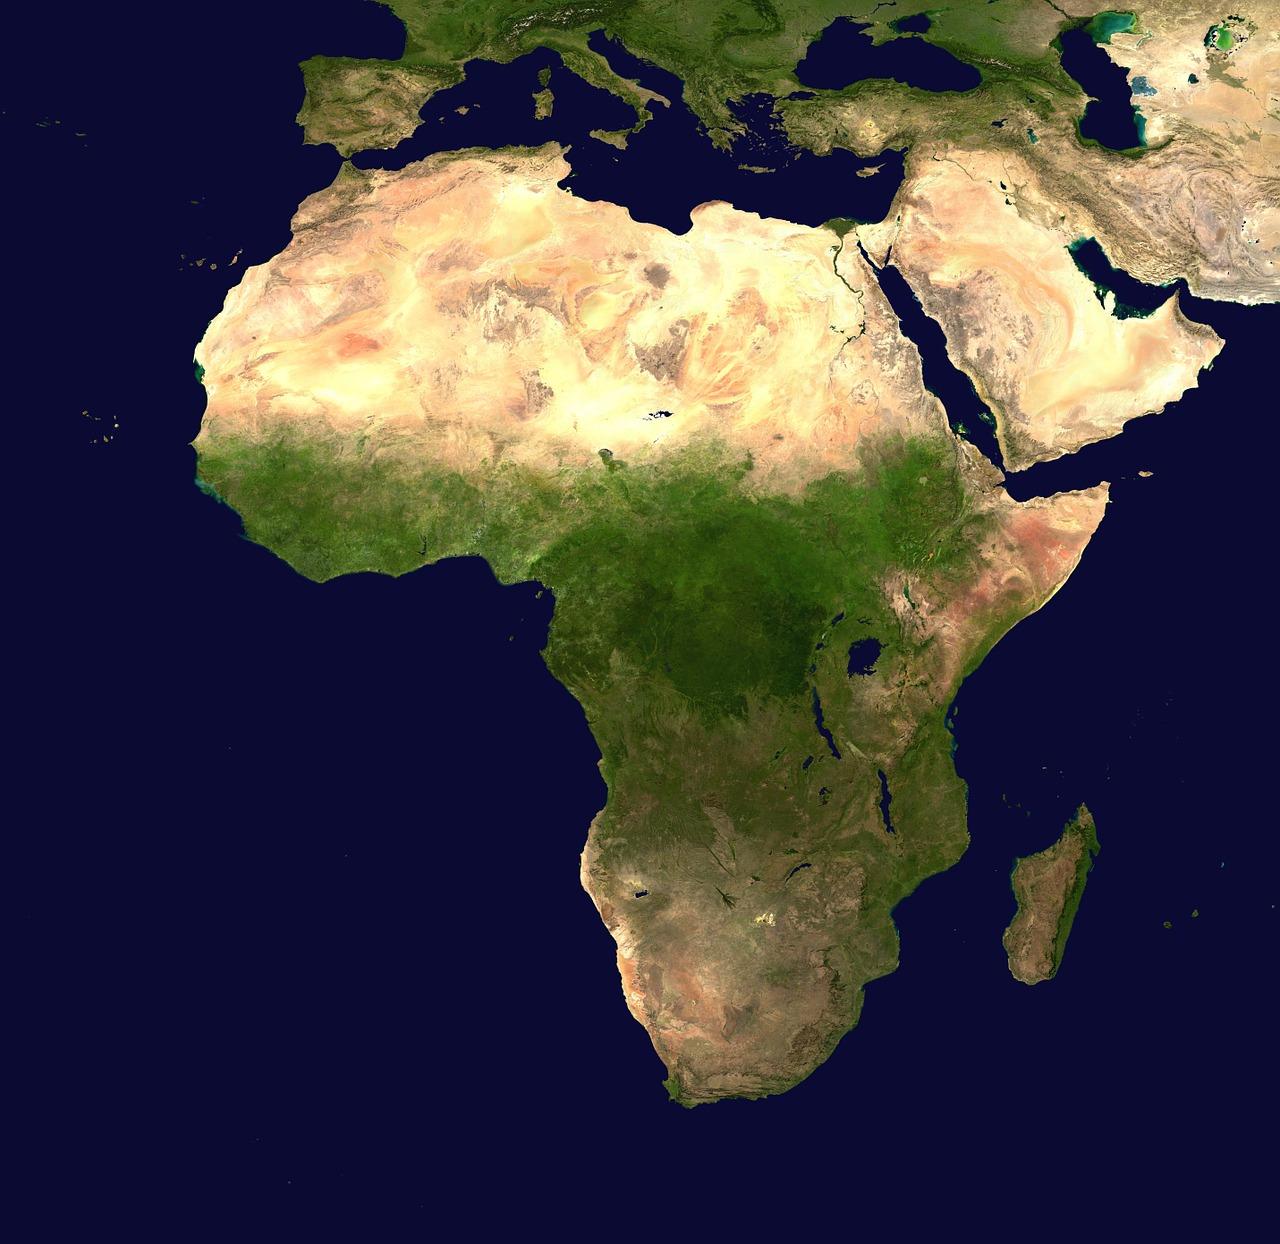 Gorilla eyes $5.6tr stakes in African expansion plan